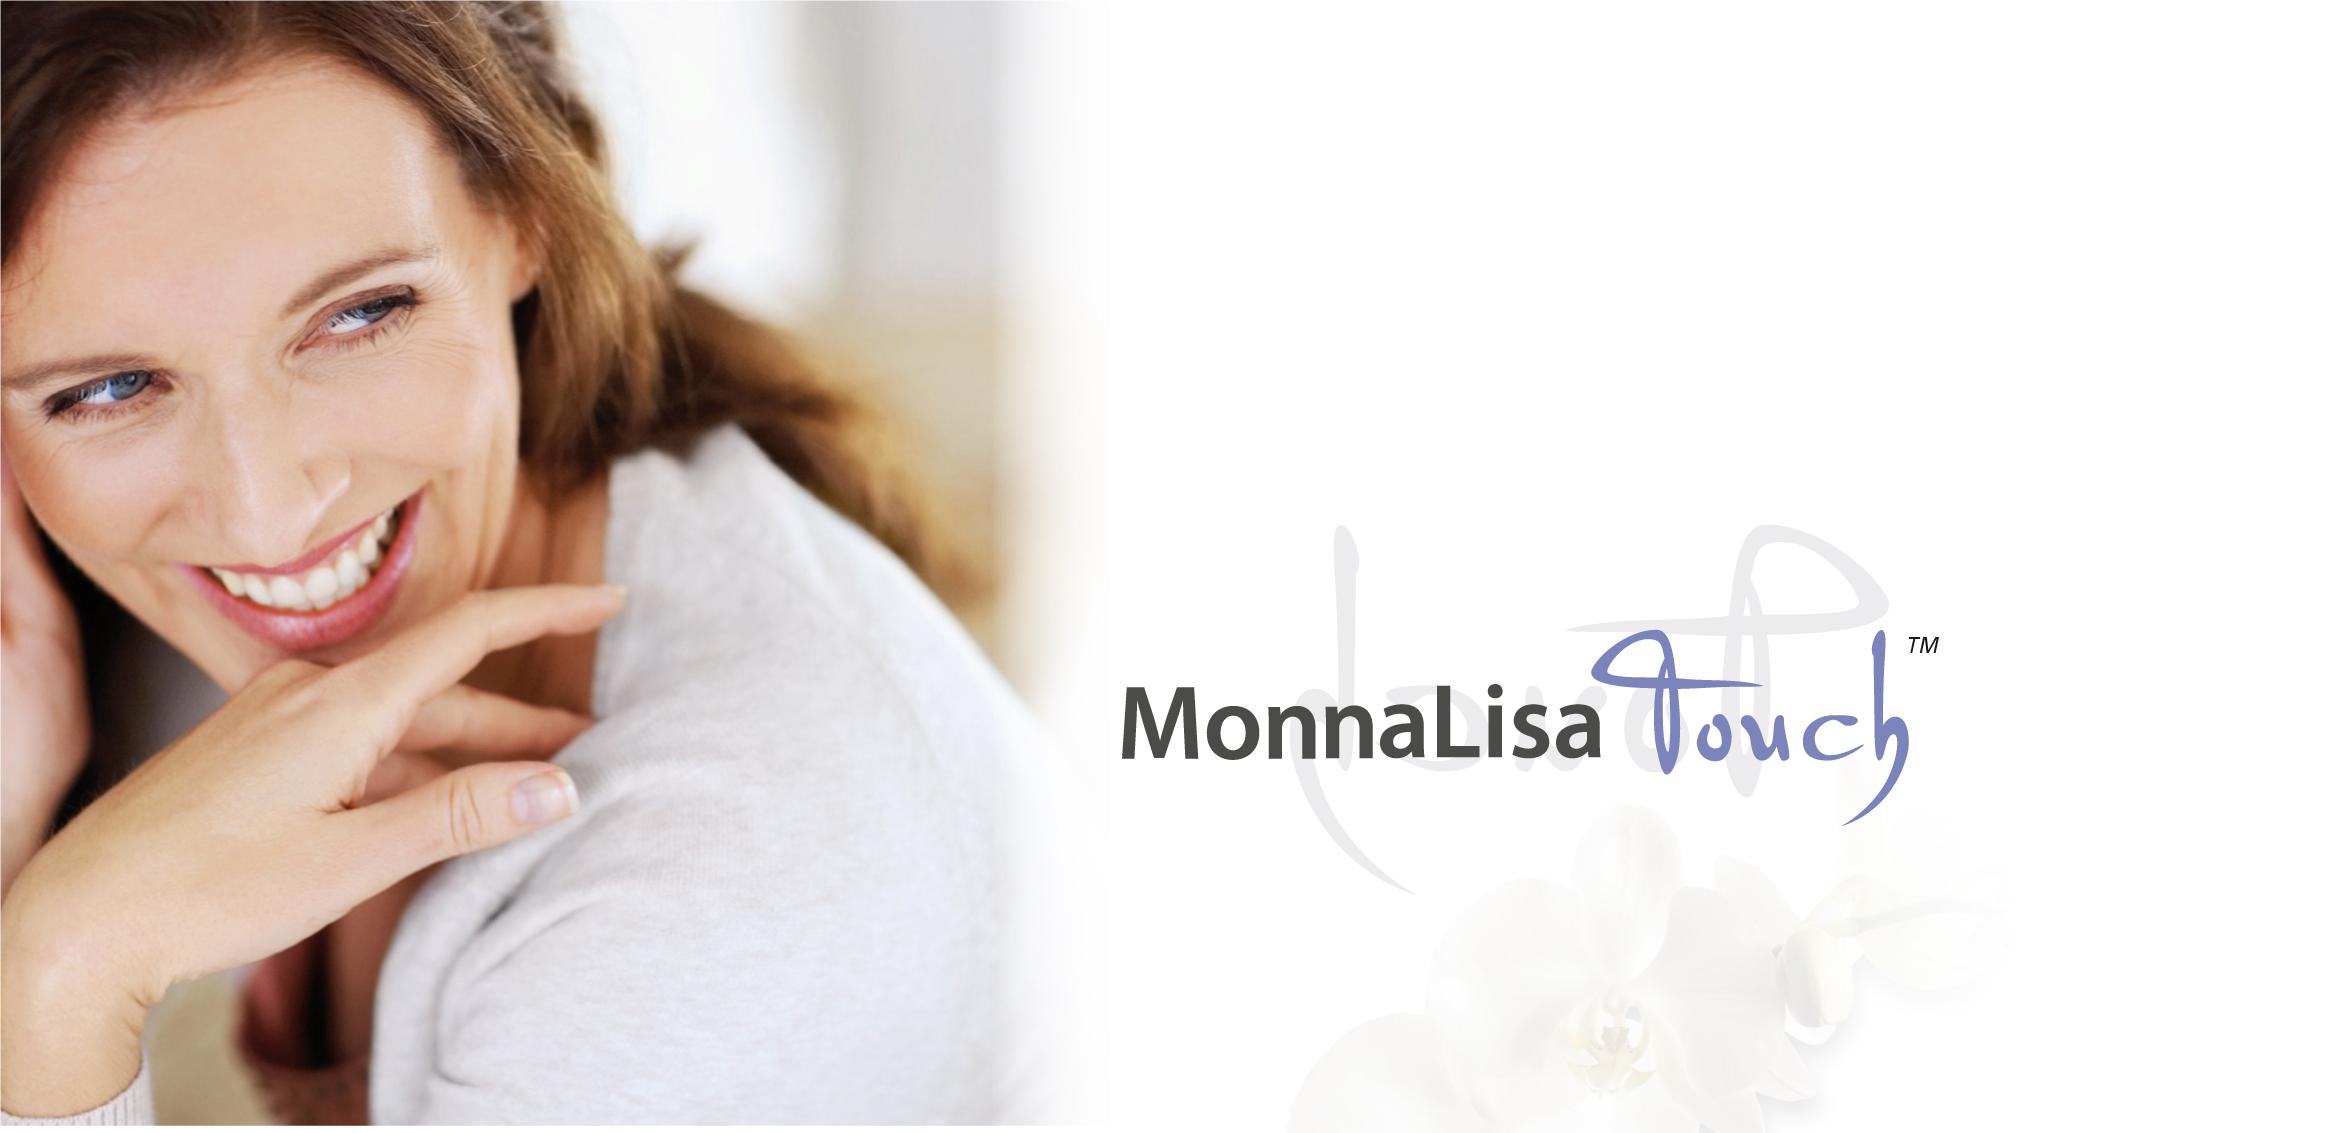 Monnalisa Touch - Terapia Laser